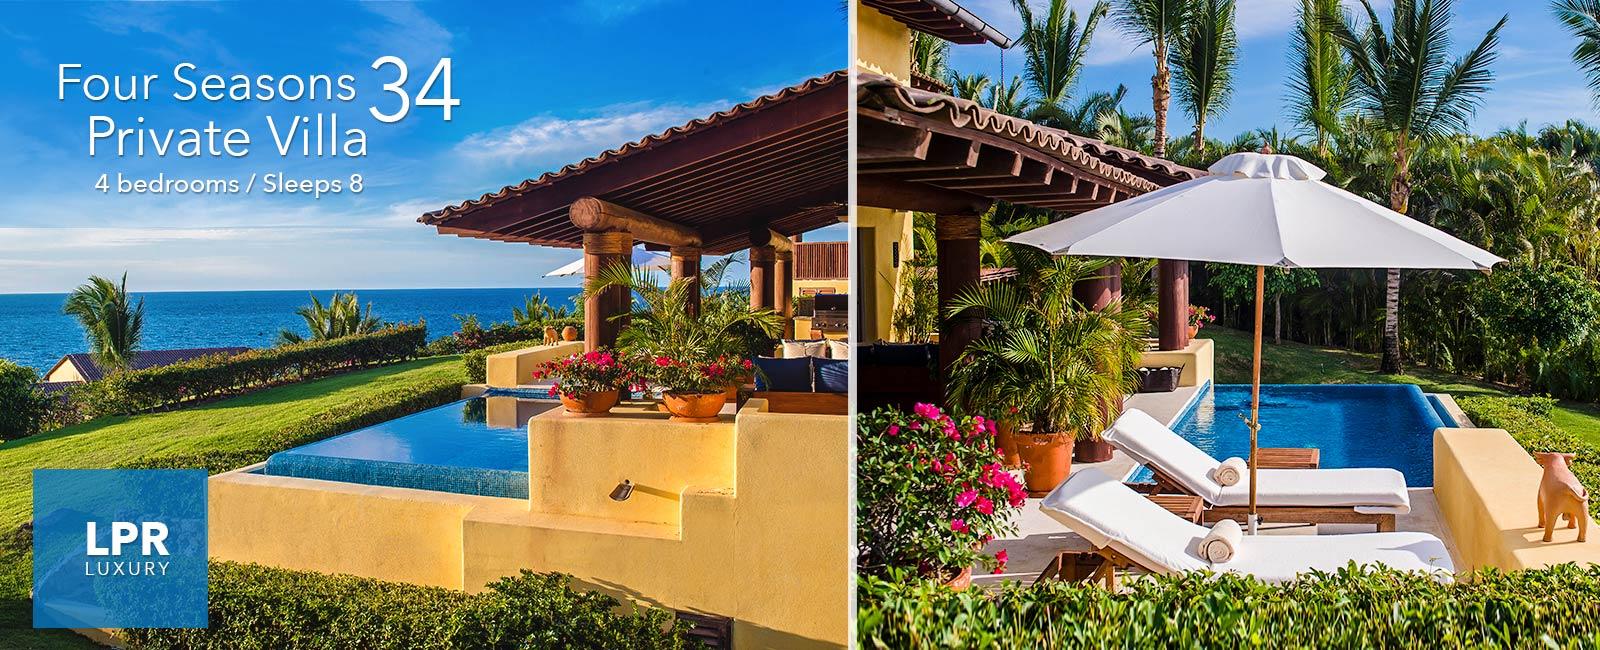 Four Seasons Private Villa 34 - Vacation rental at the Four Seasons Punta Mita Mexico